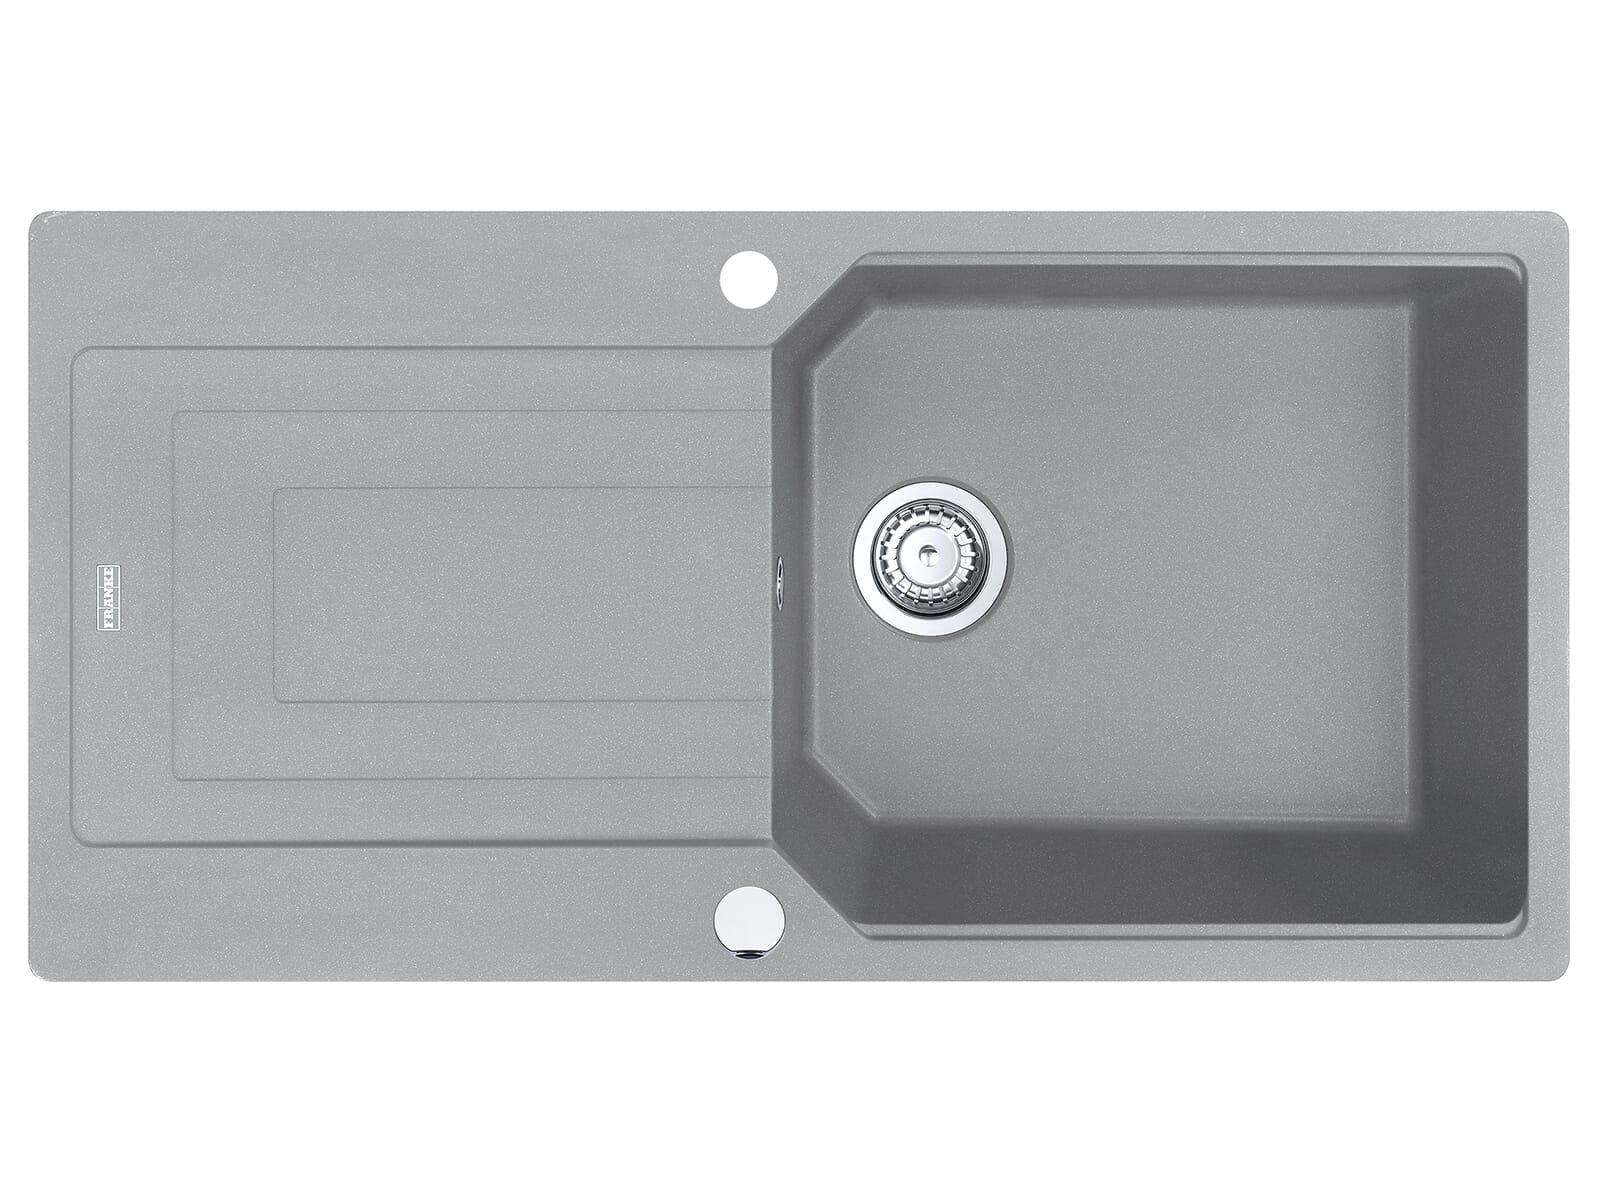 Franke Urban UBG 611-100 Steingrau - 11943 Granitspüle Exzenterbetätigung